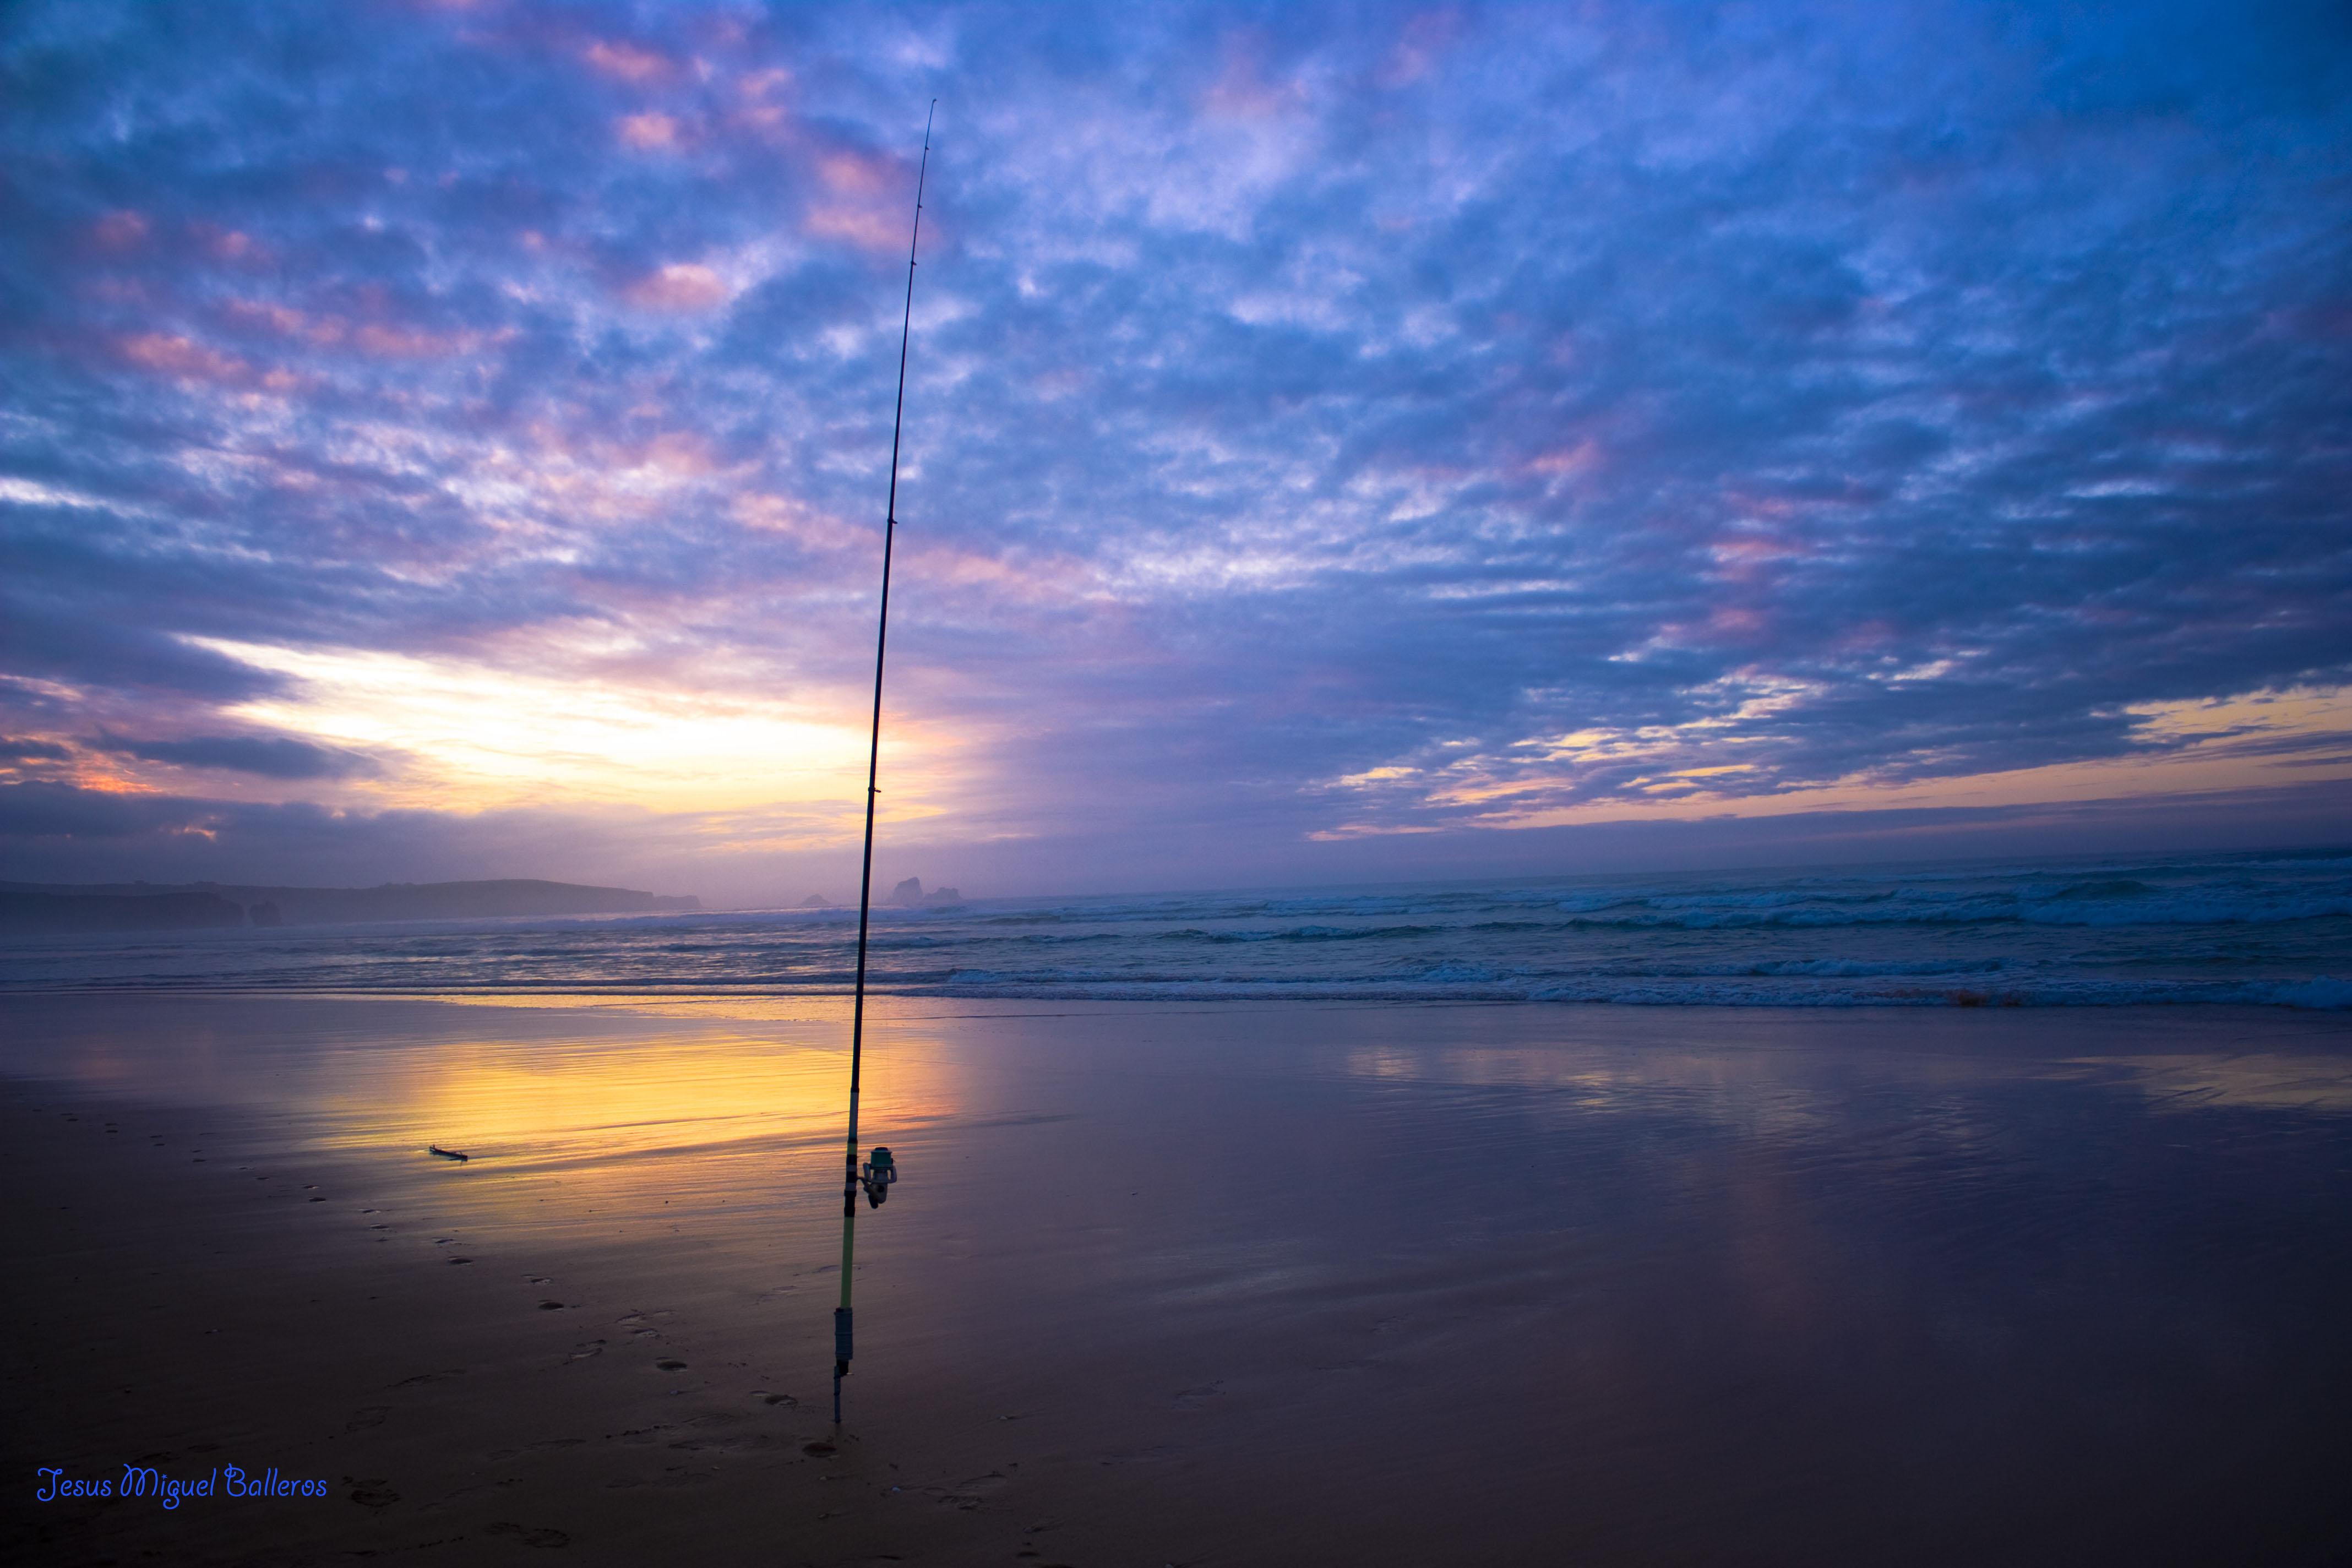 Foto playa Kapelaundi / Malda Ranas / Manorranas. *Playa De Liencres